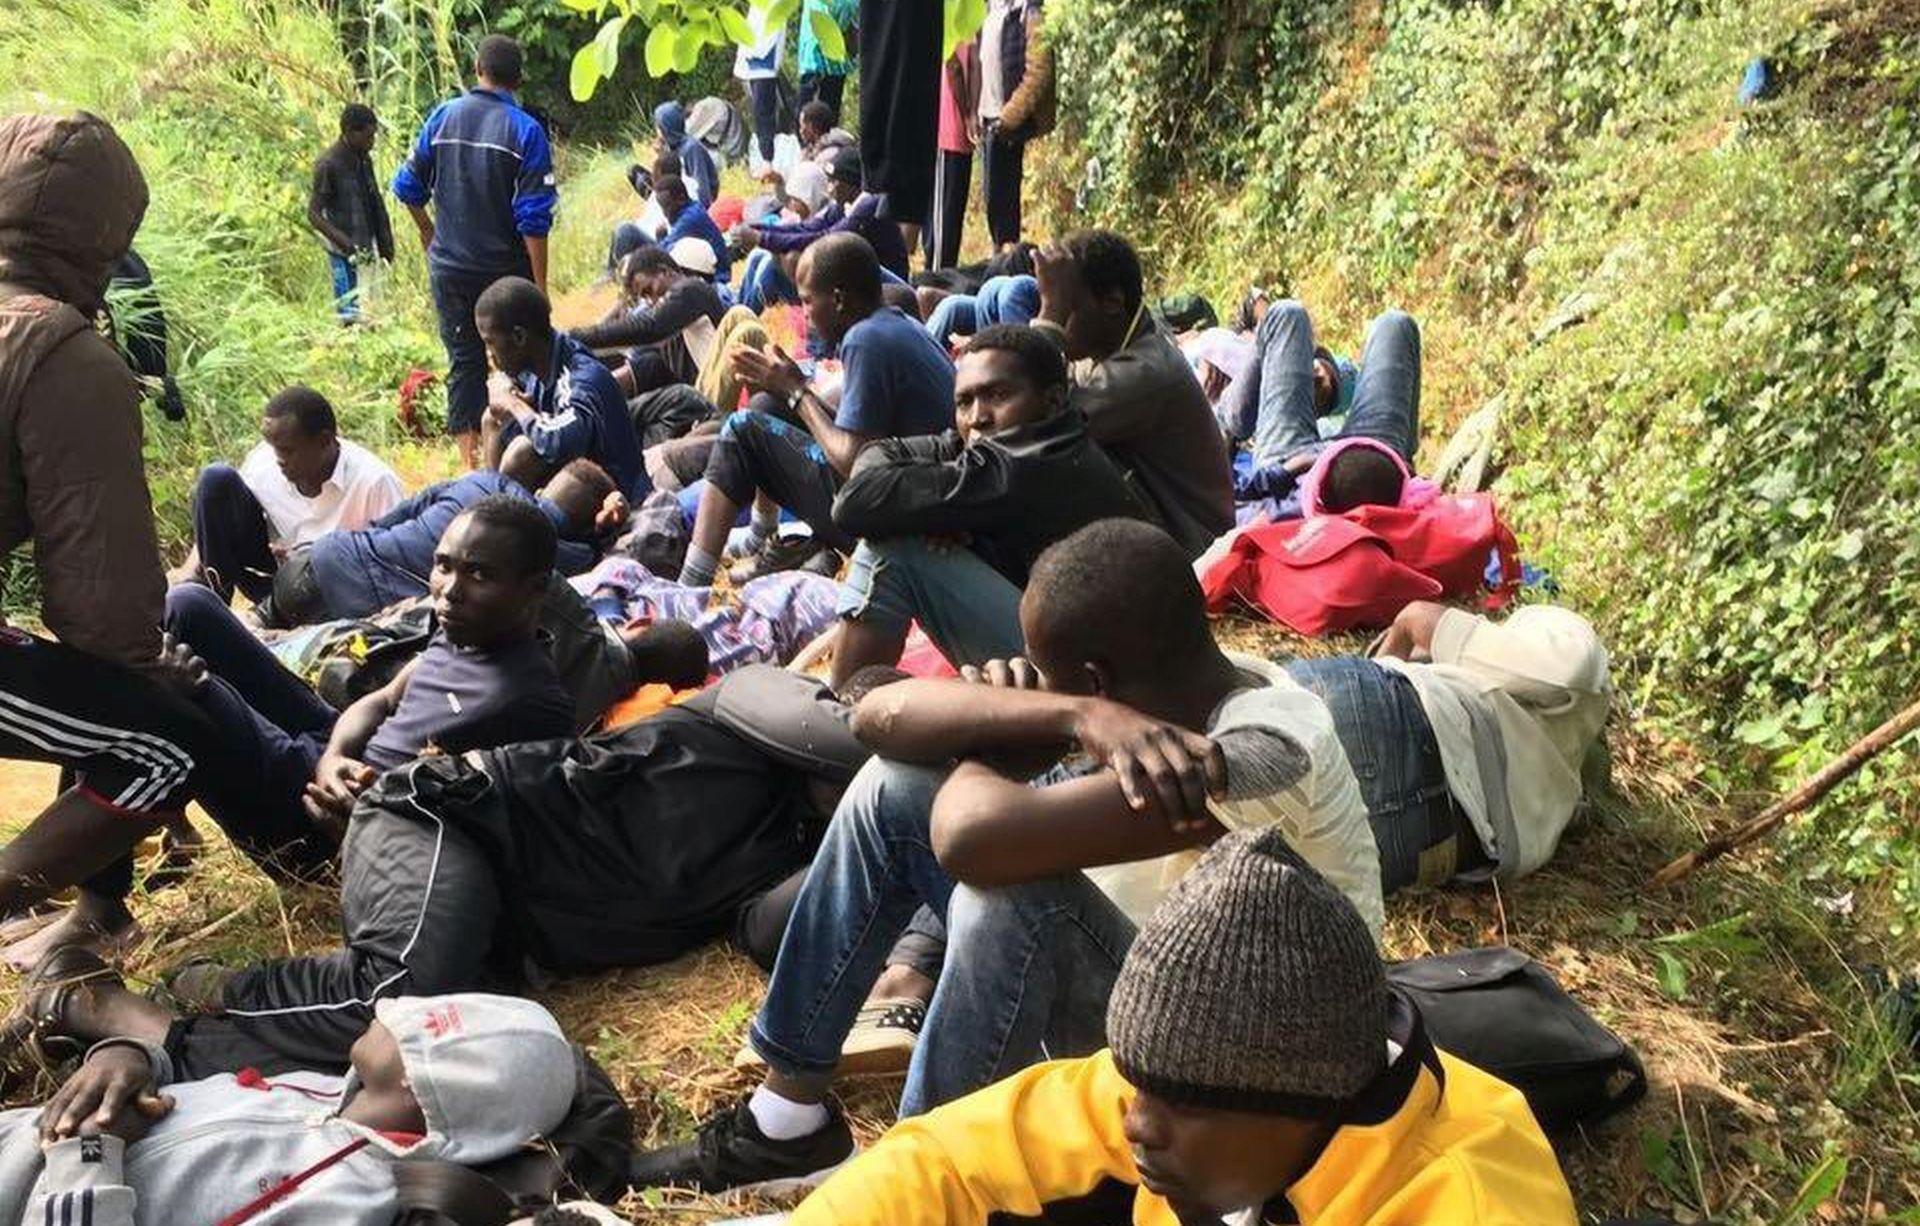 Karavana migranata dovela Meksiko u neugodan položaj